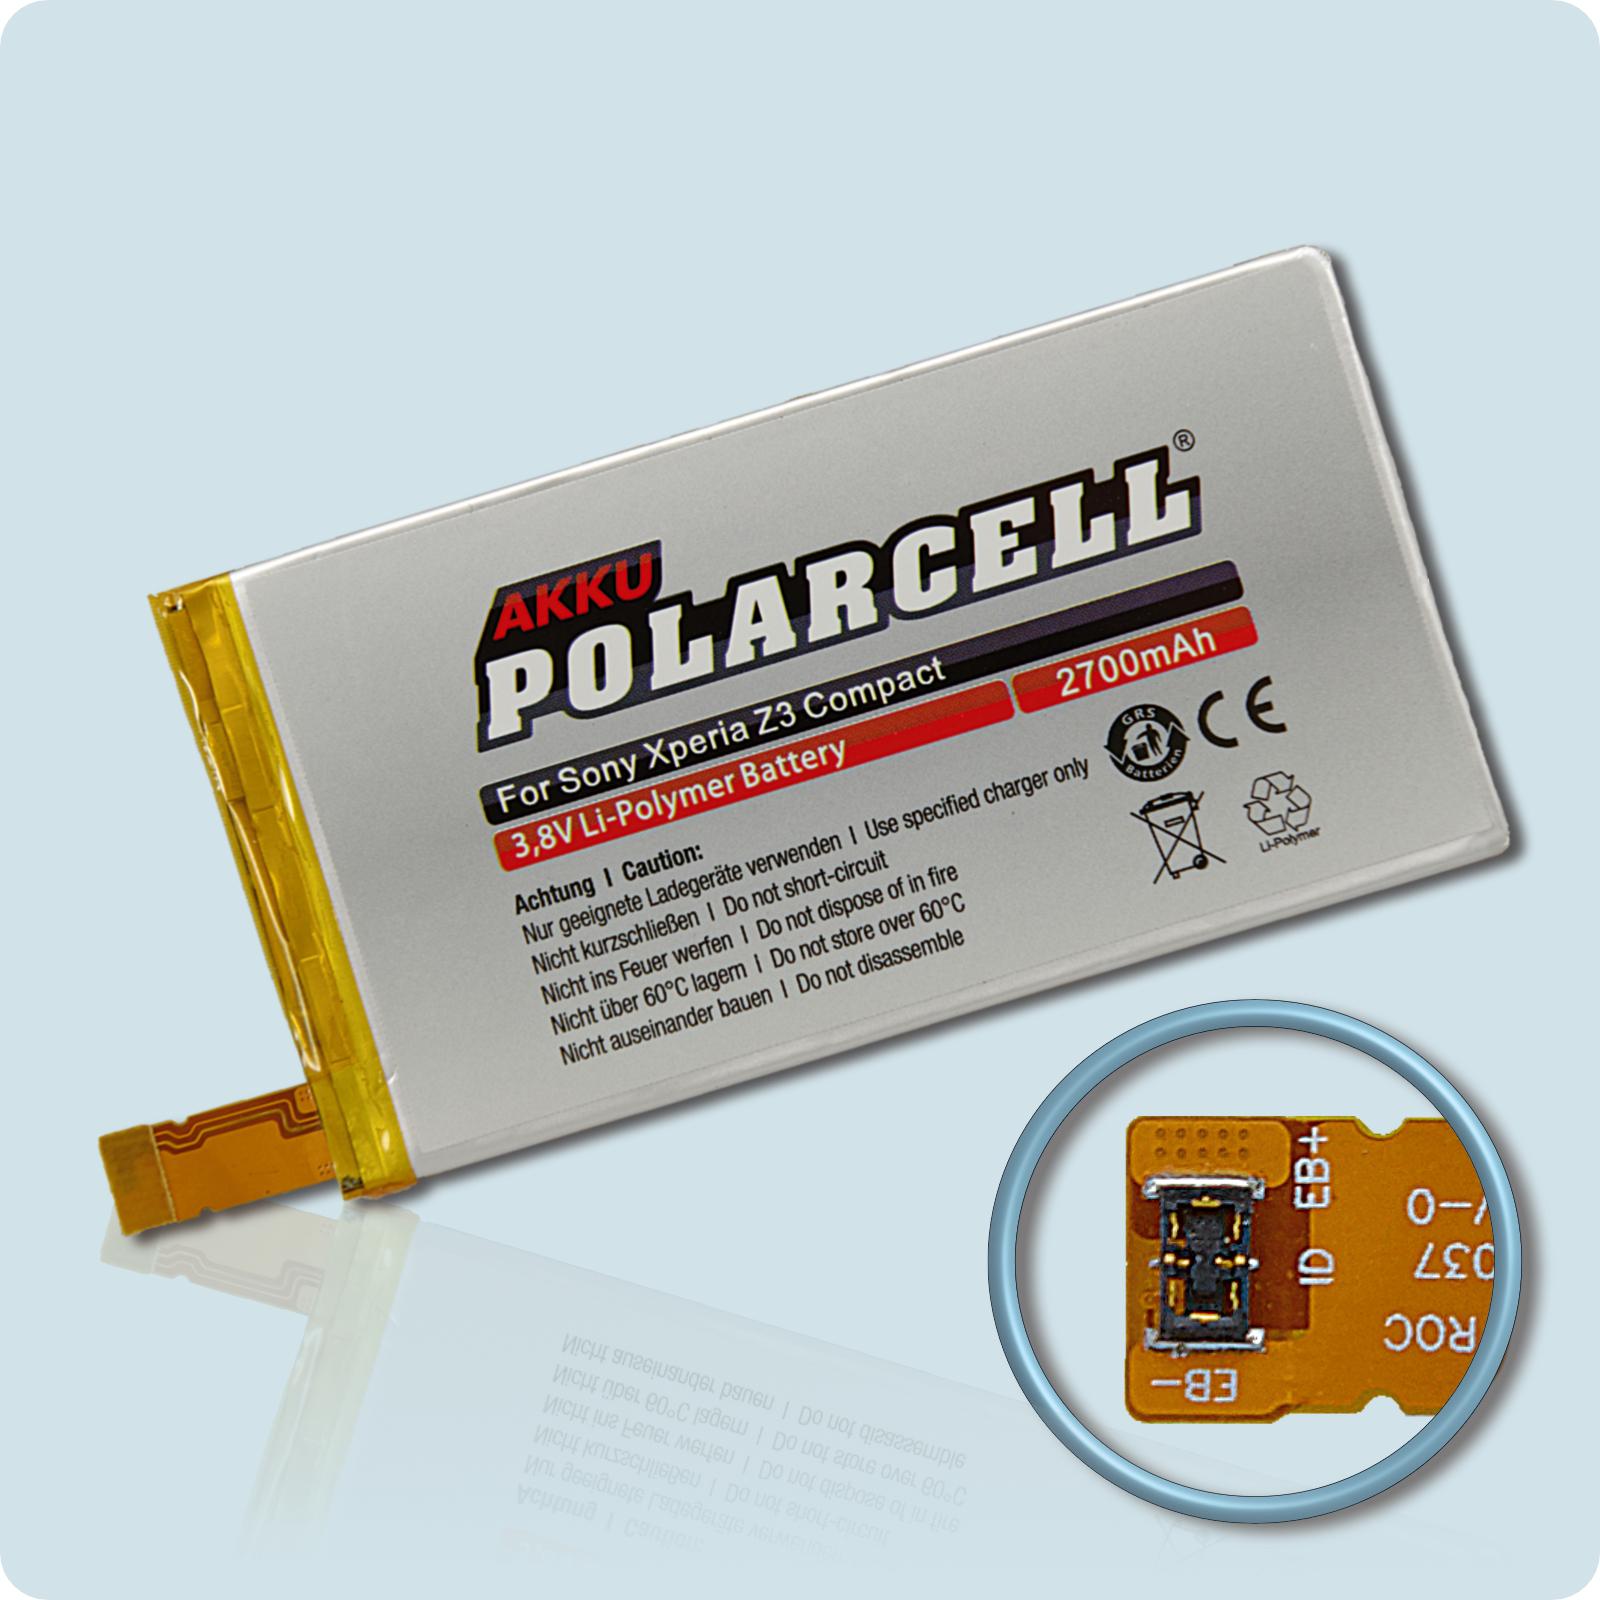 PolarCell® Hochleistungsakku für Sony Xperia Z3 Compact, ersetzt Originalakku LIS1561ERPC